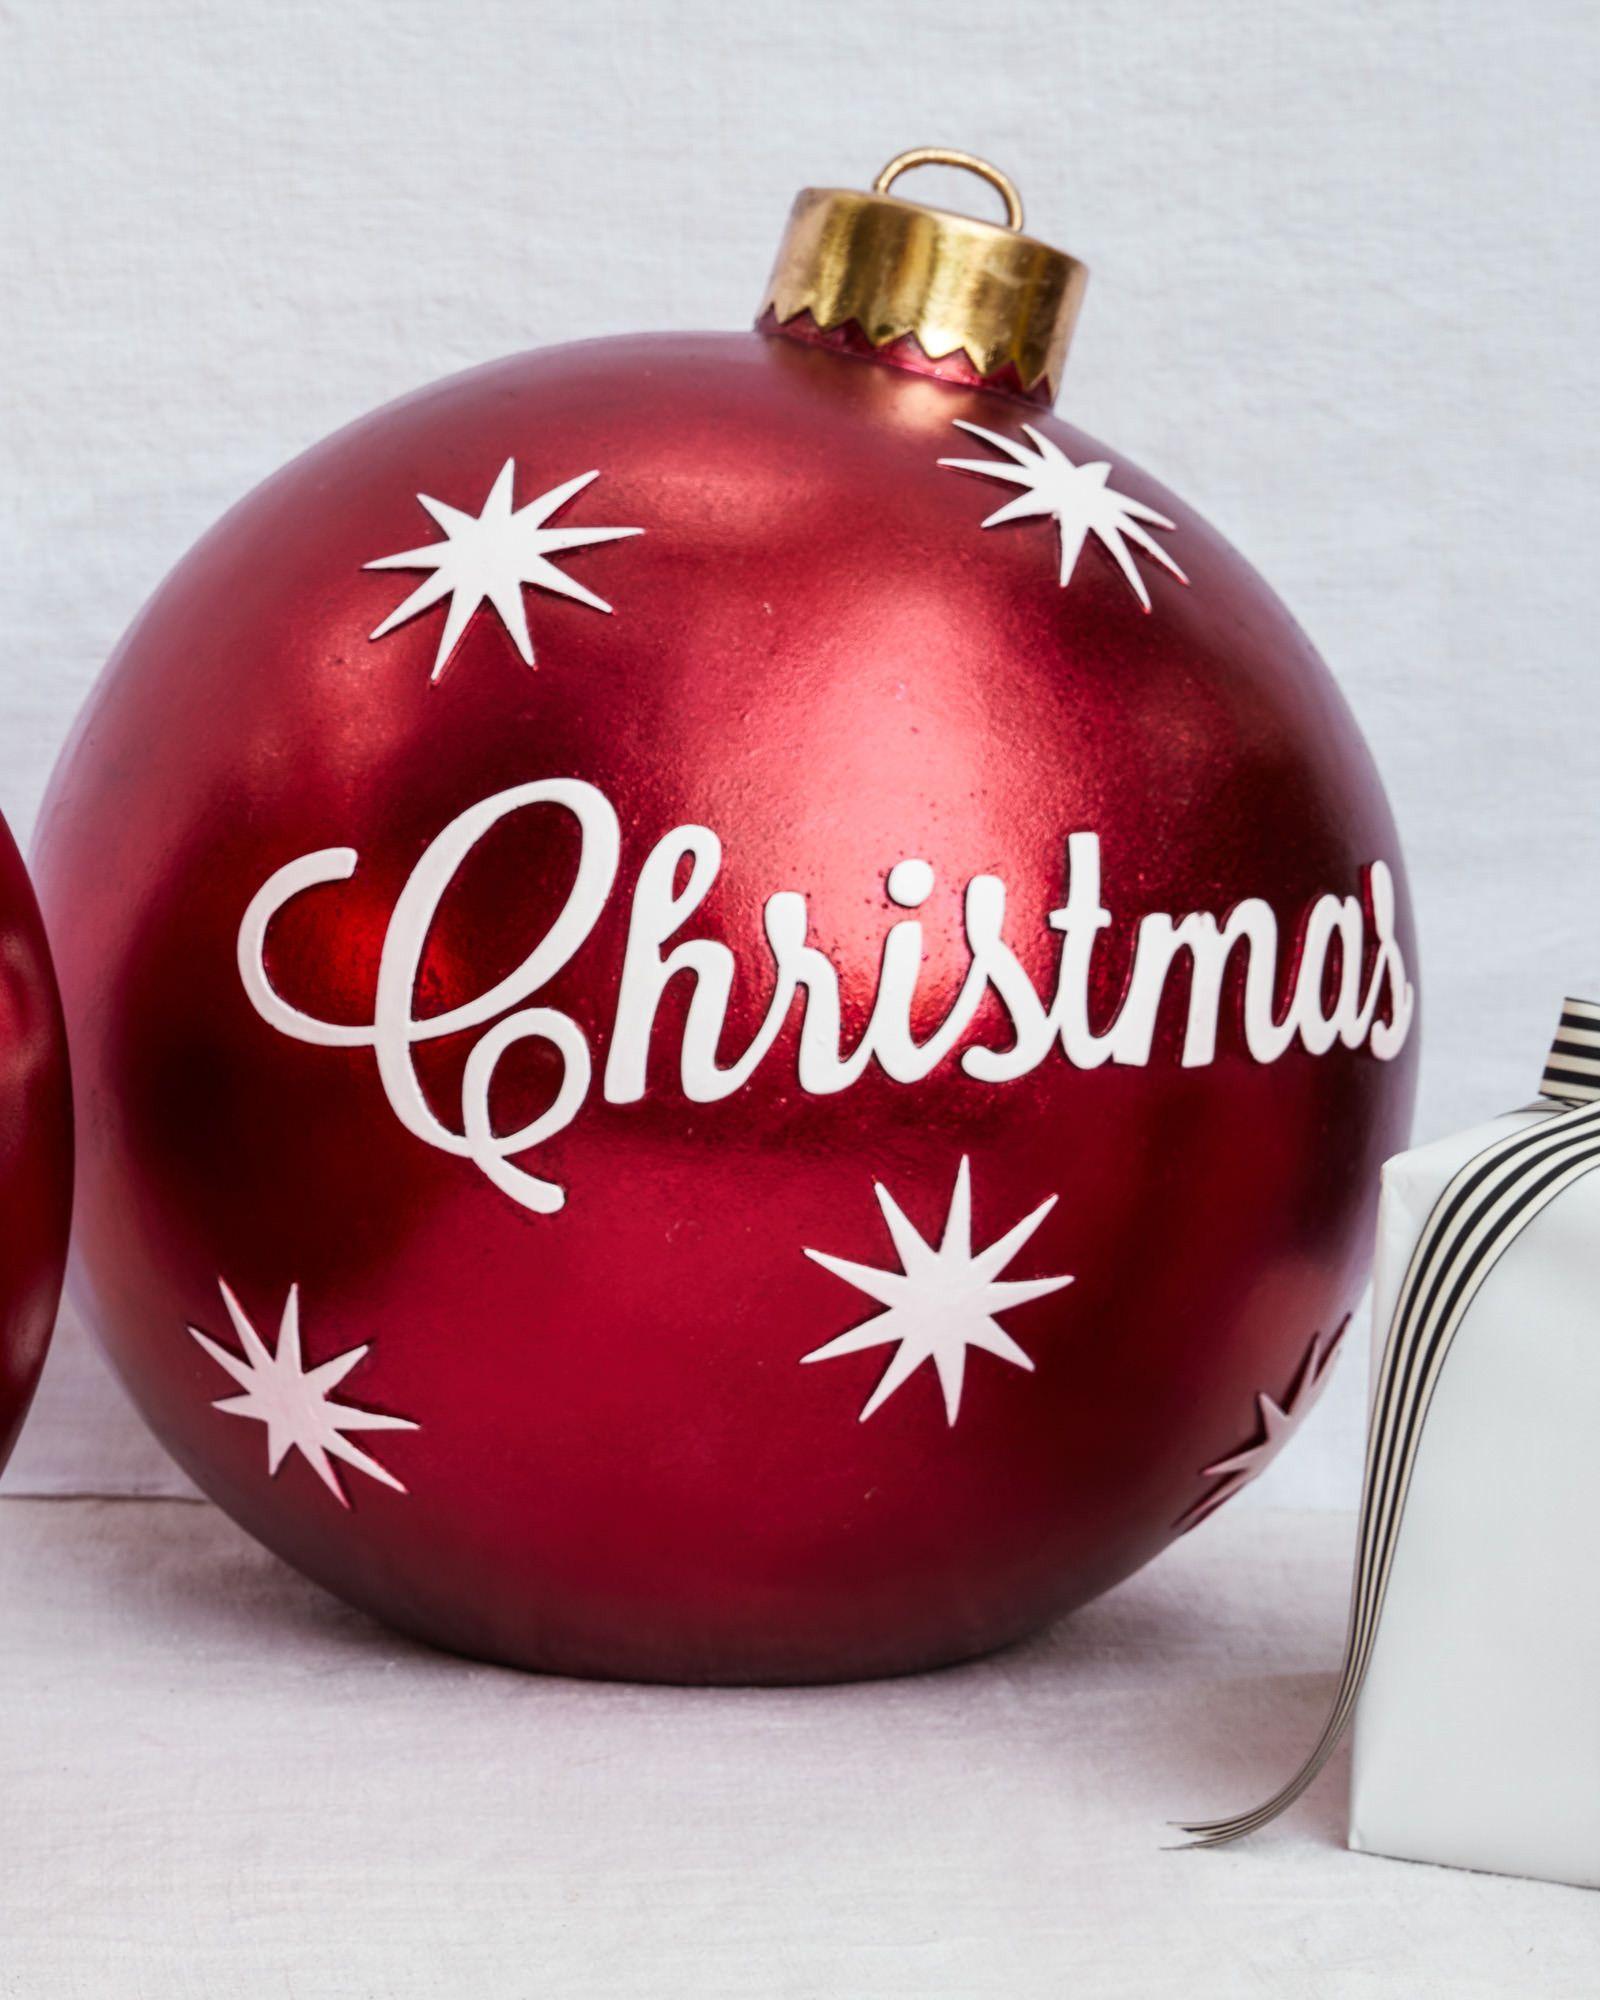 Merry christmas-26227